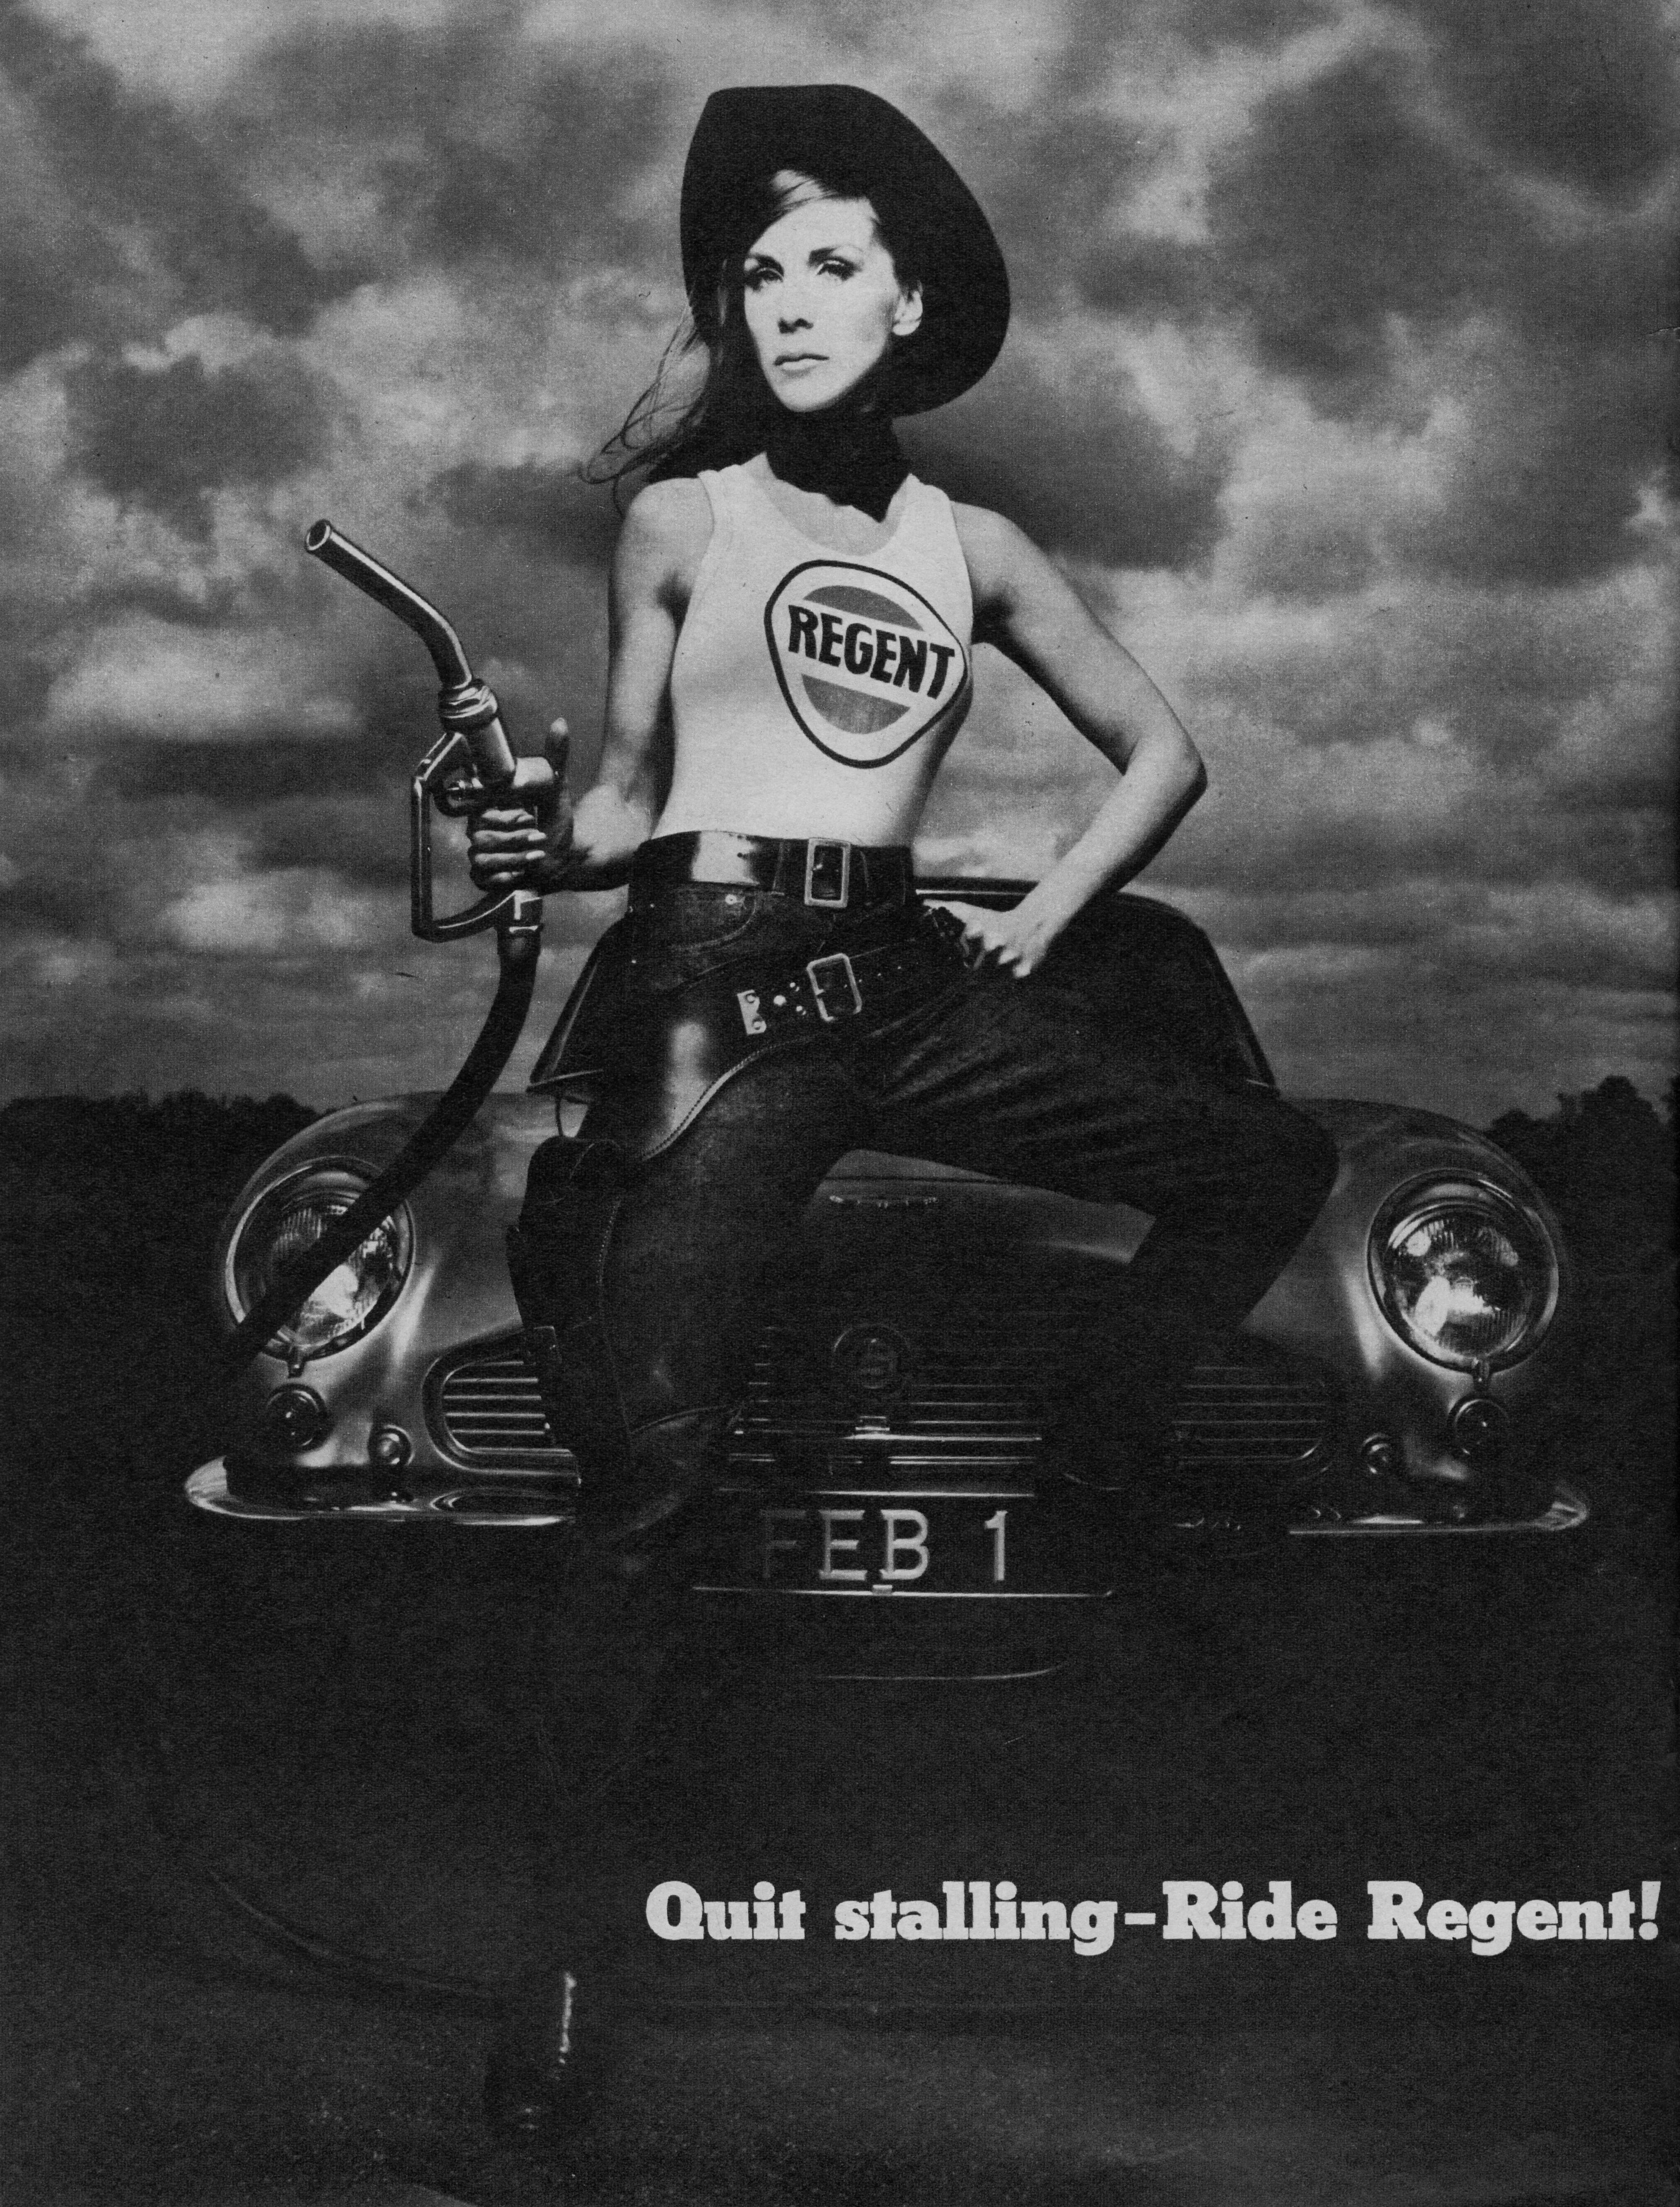 Jet Petrol, 'Quit Stalling', KMP, Ray Rathbone-01